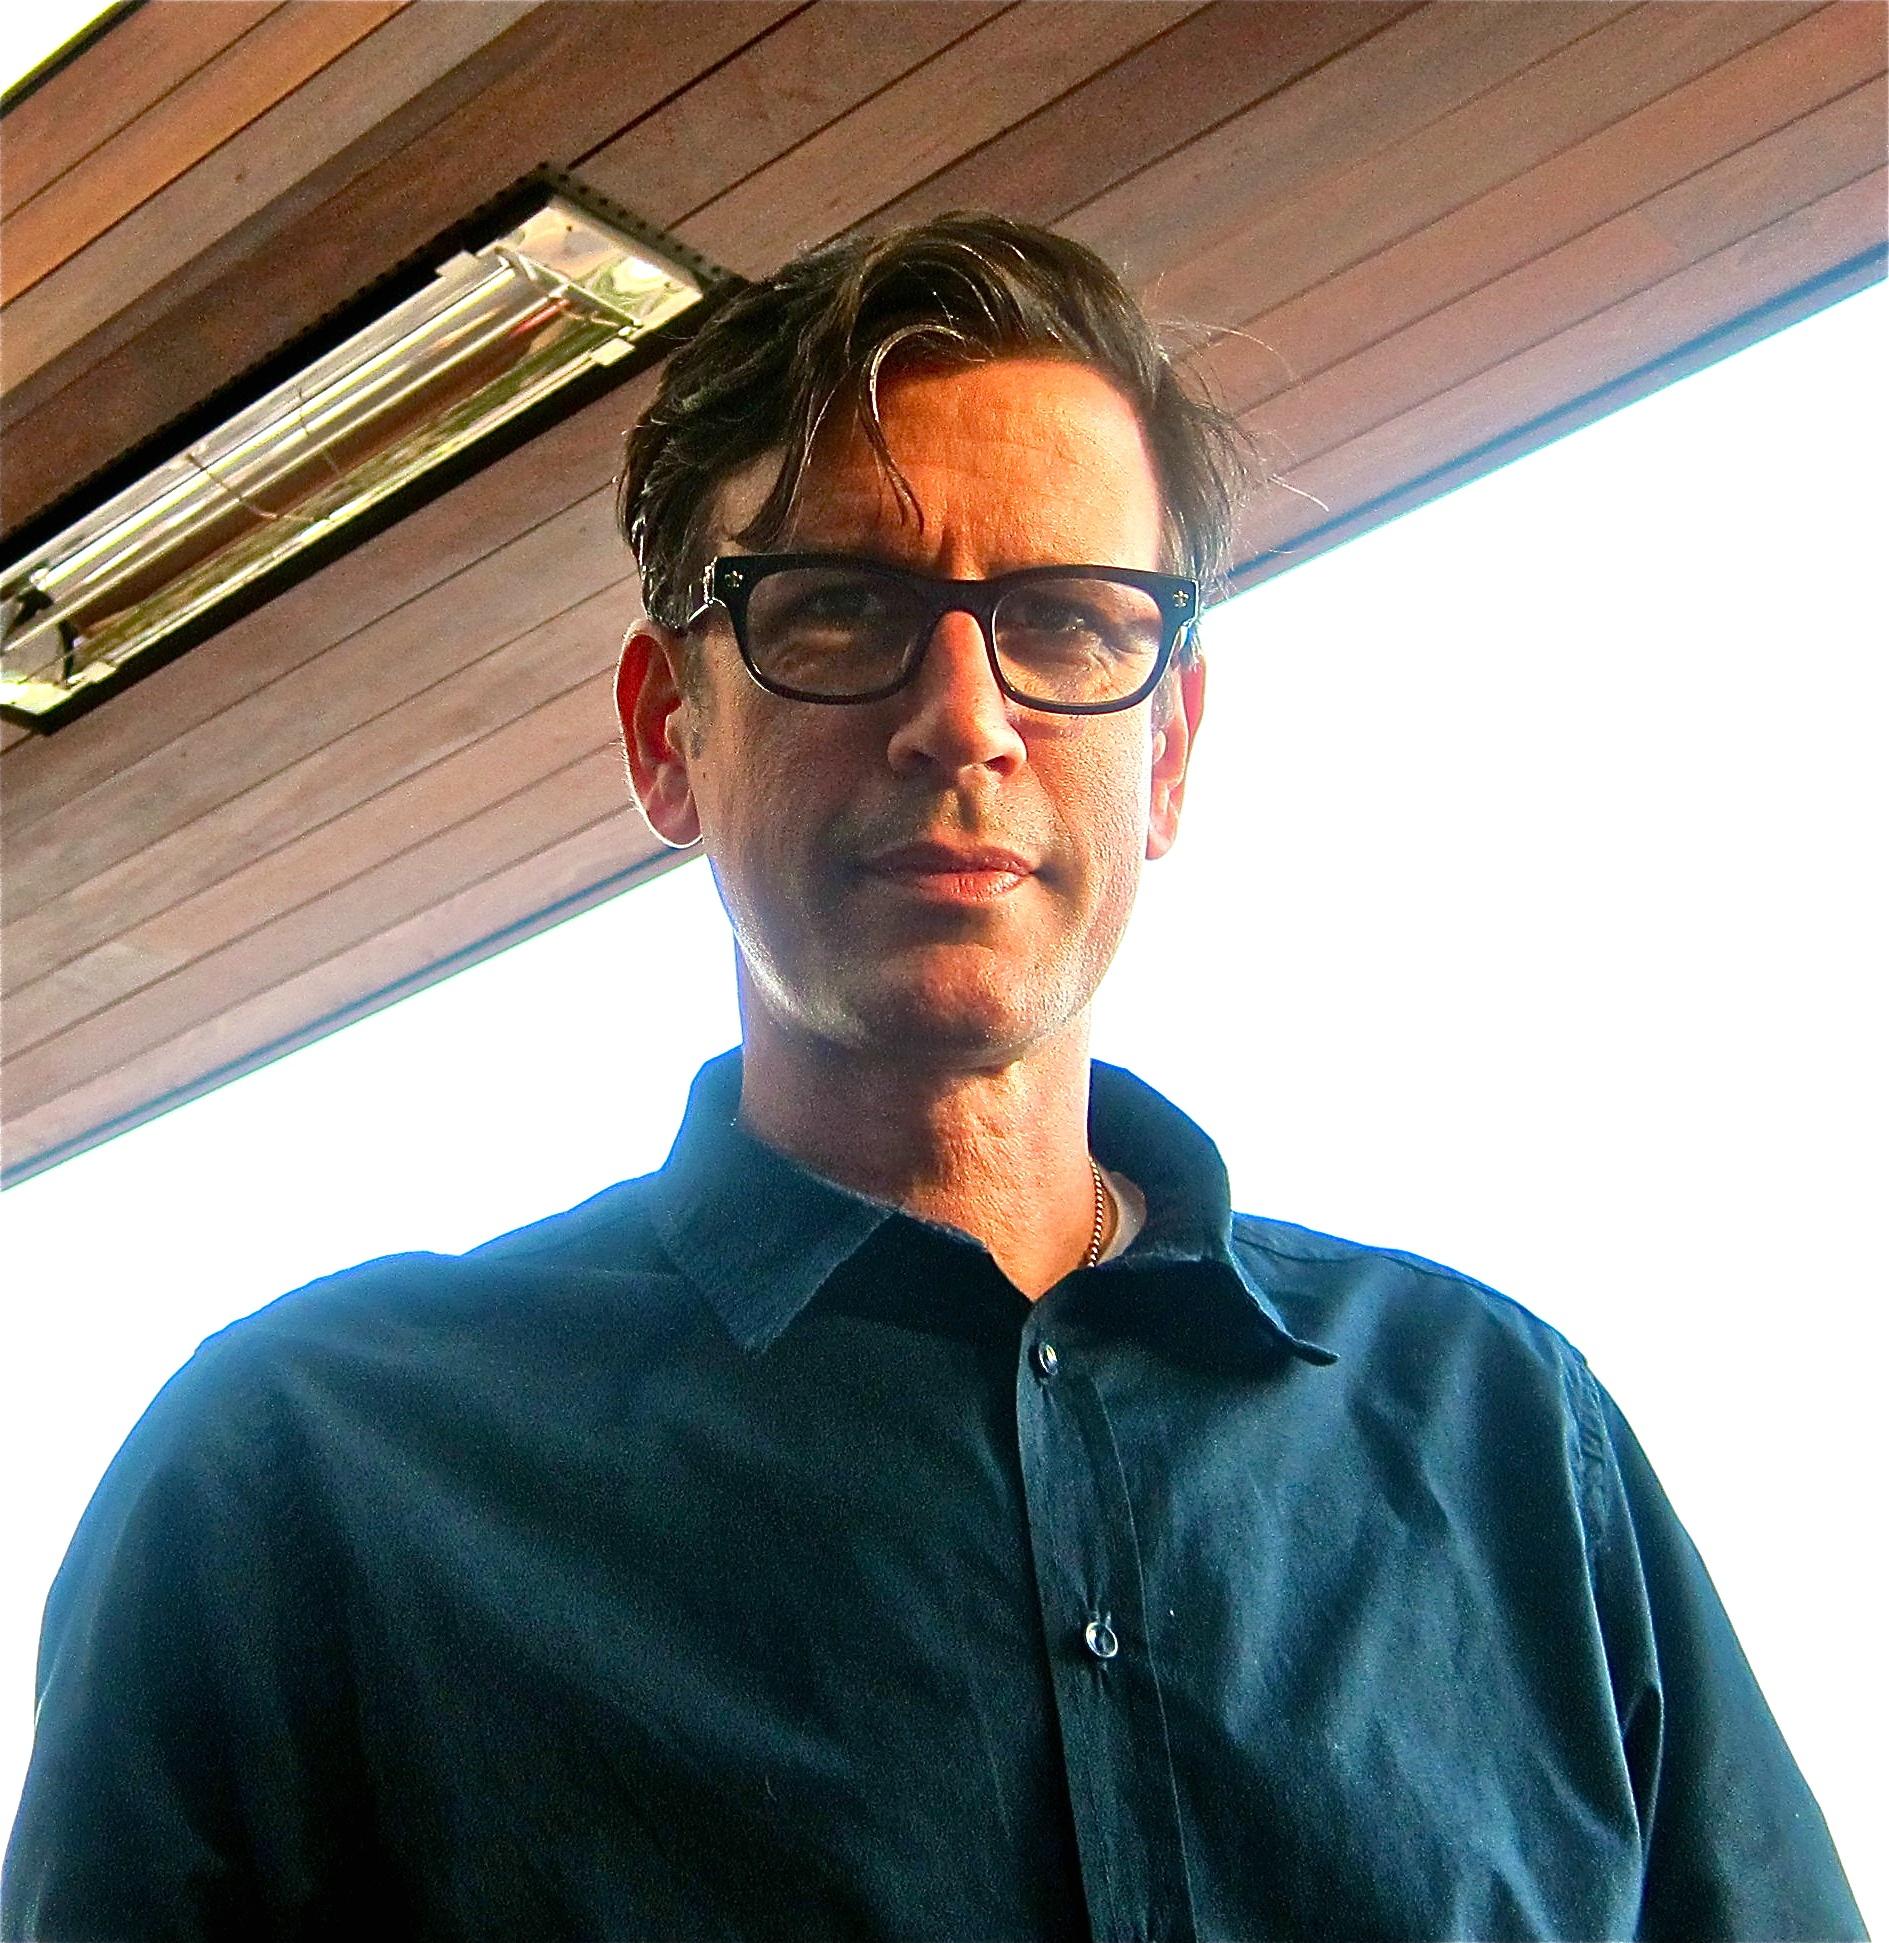 Exec Chef Gregorio Stephenson